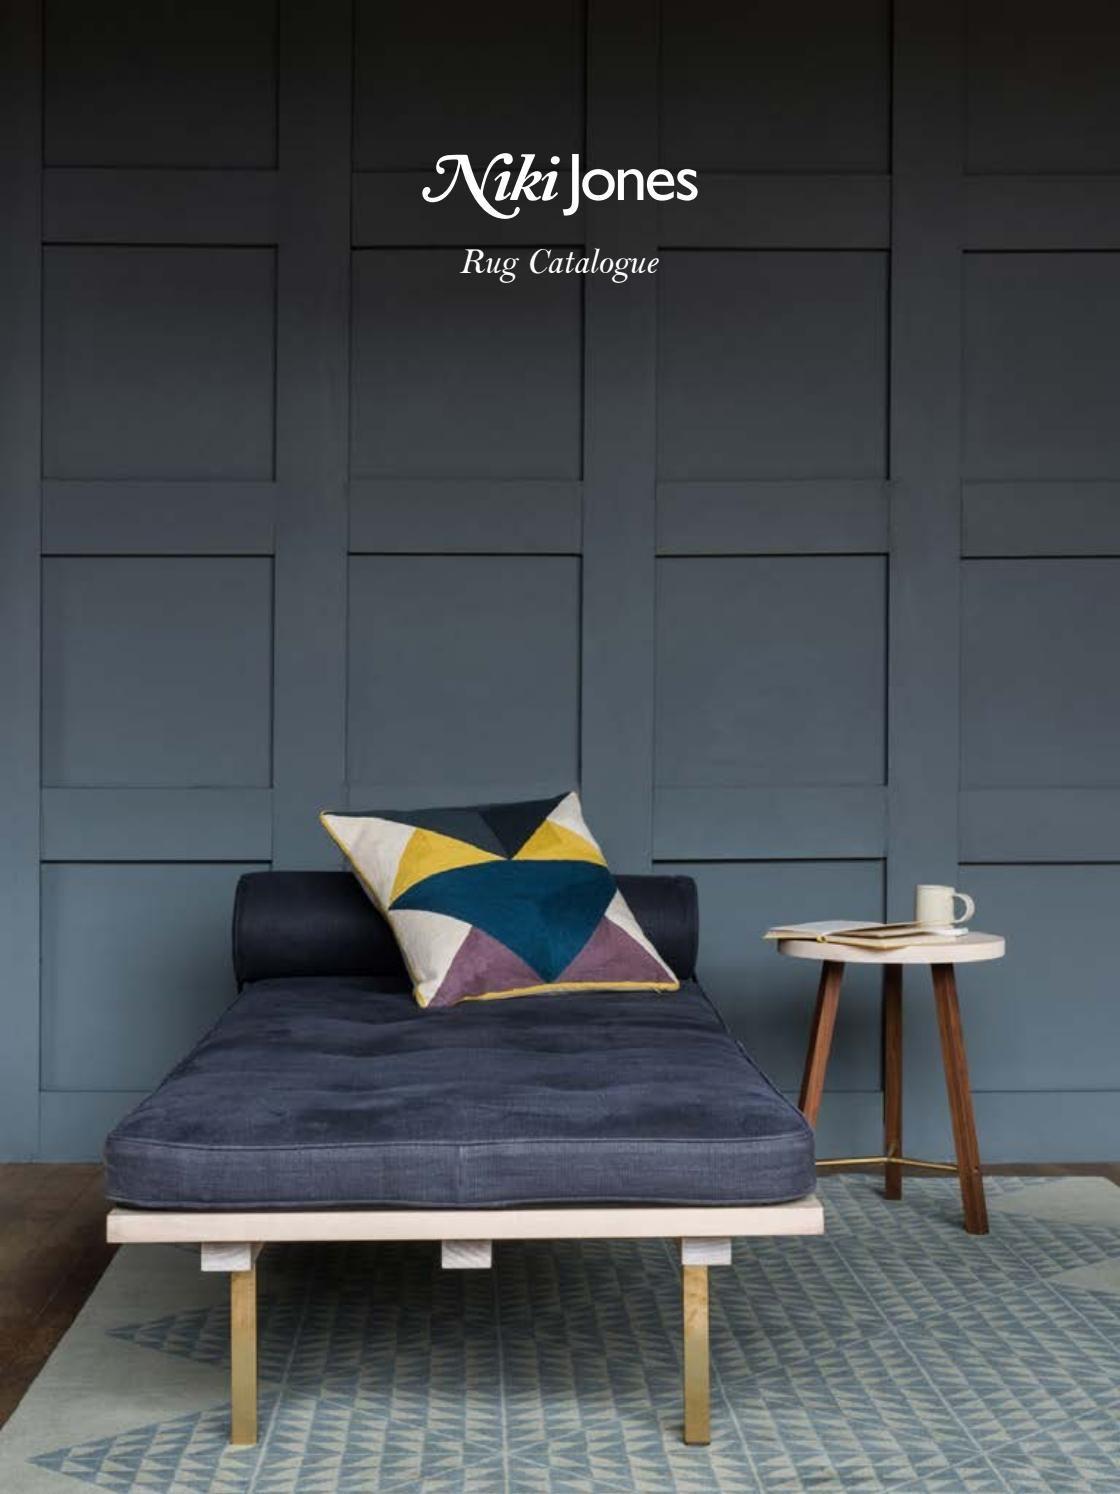 Niki Jones Rug Catalogue Cushions